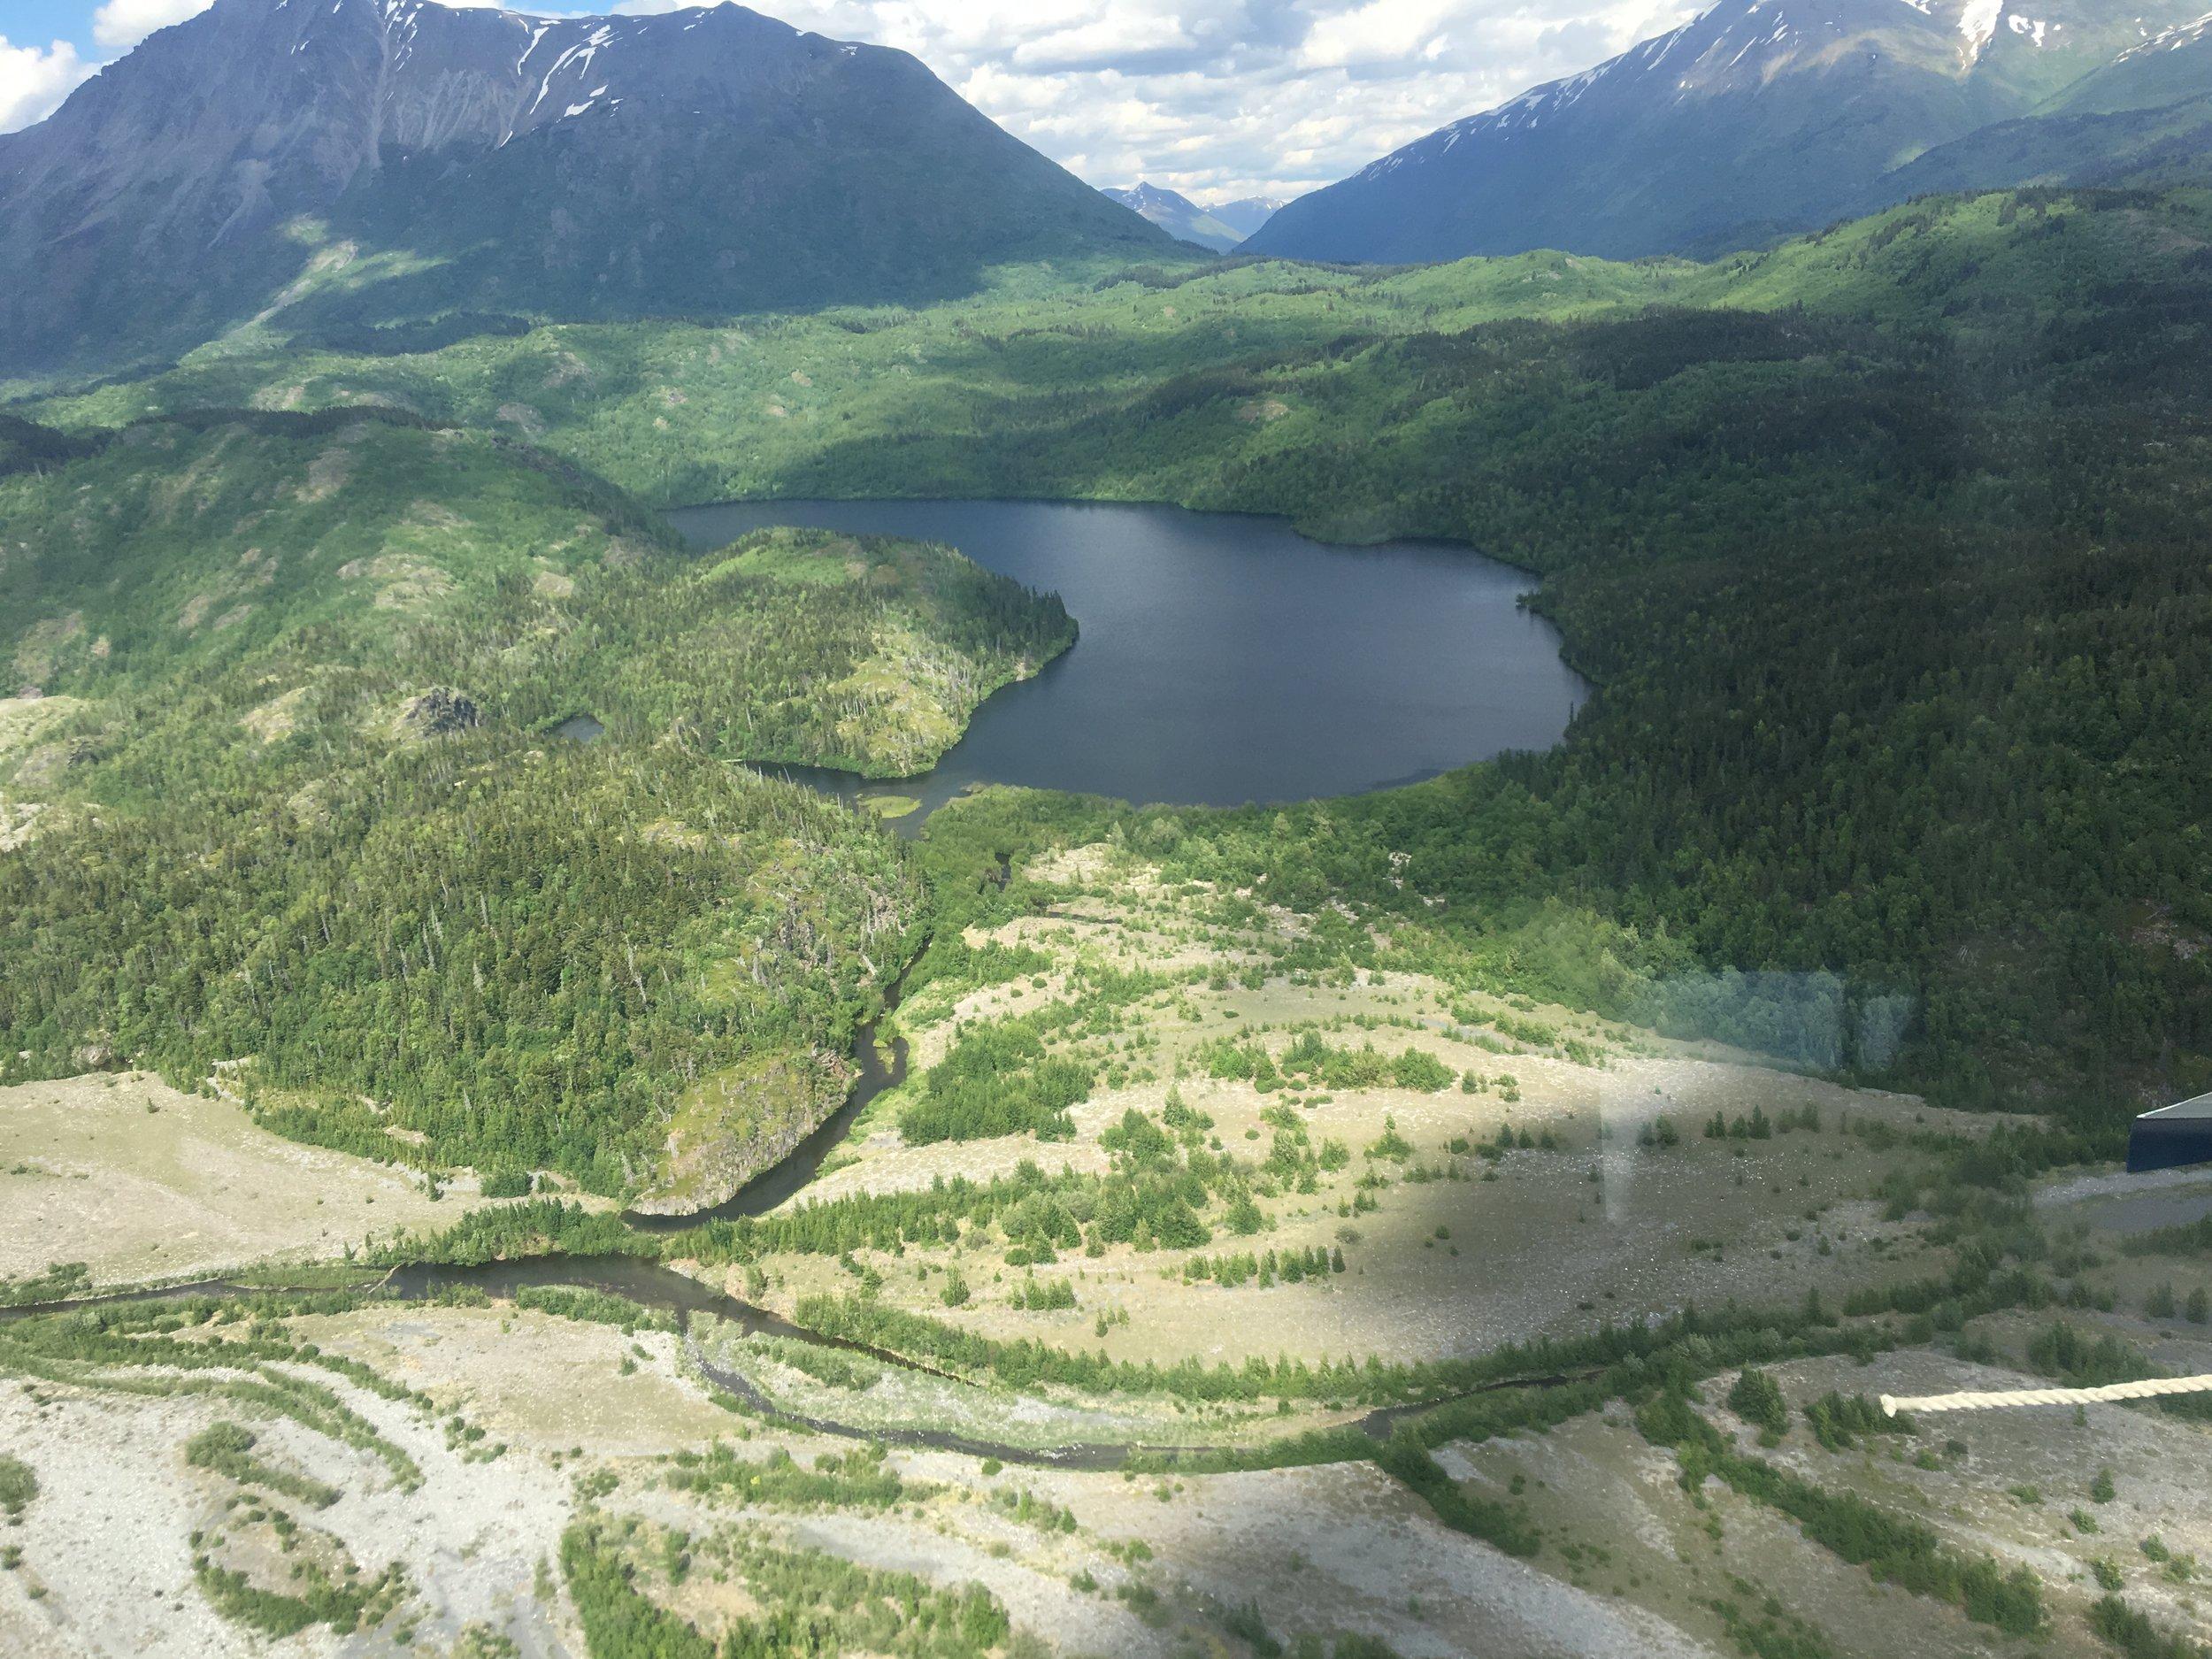 Aerial view of Pothole Lake